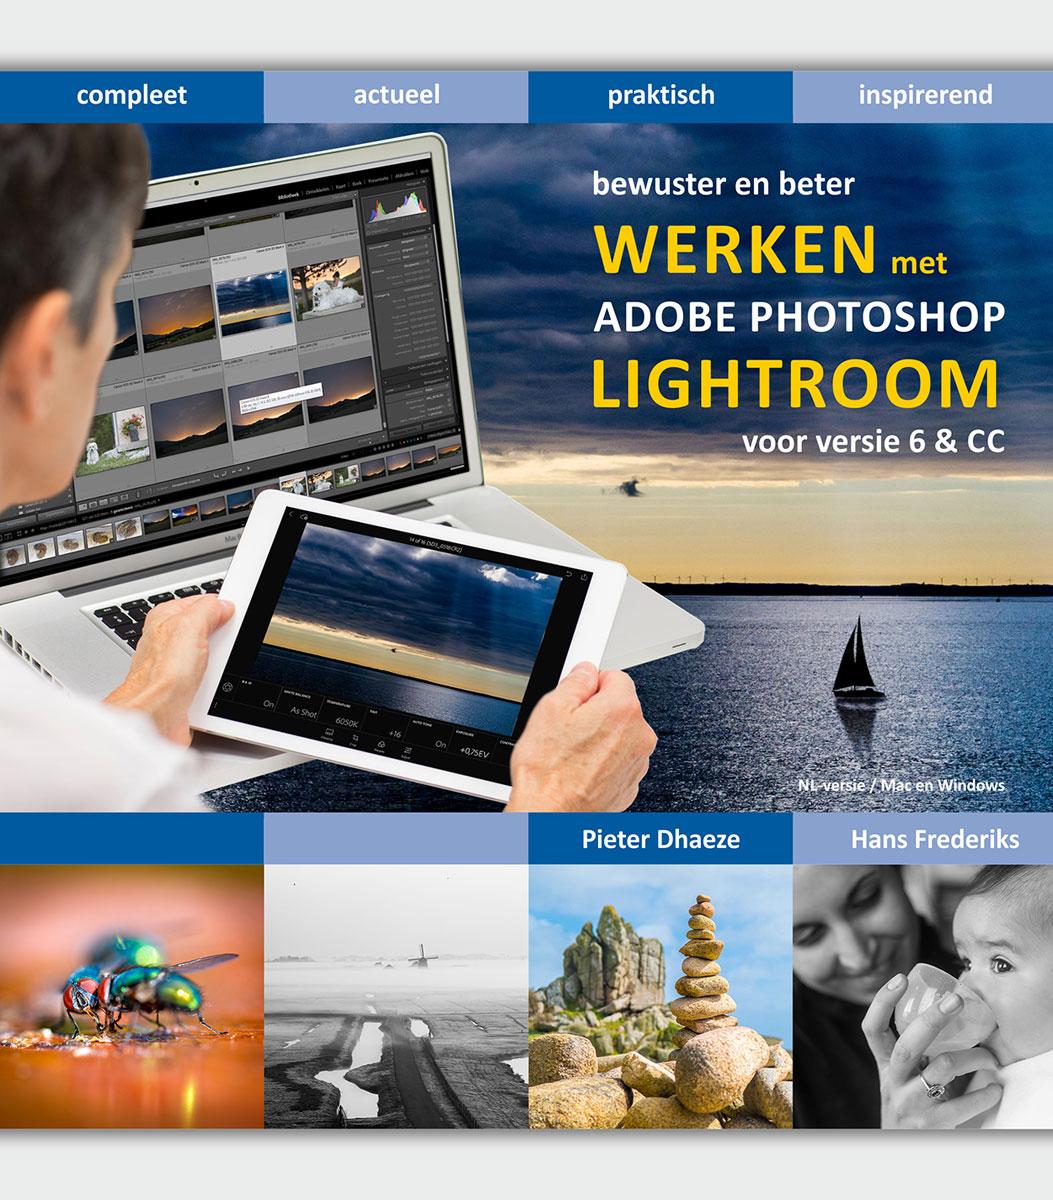 coverfoto Bewuster en beter werken met Adobe Photoshop Lightroom 6 & CC- Pieter Dhaeze/Hans Frederiks